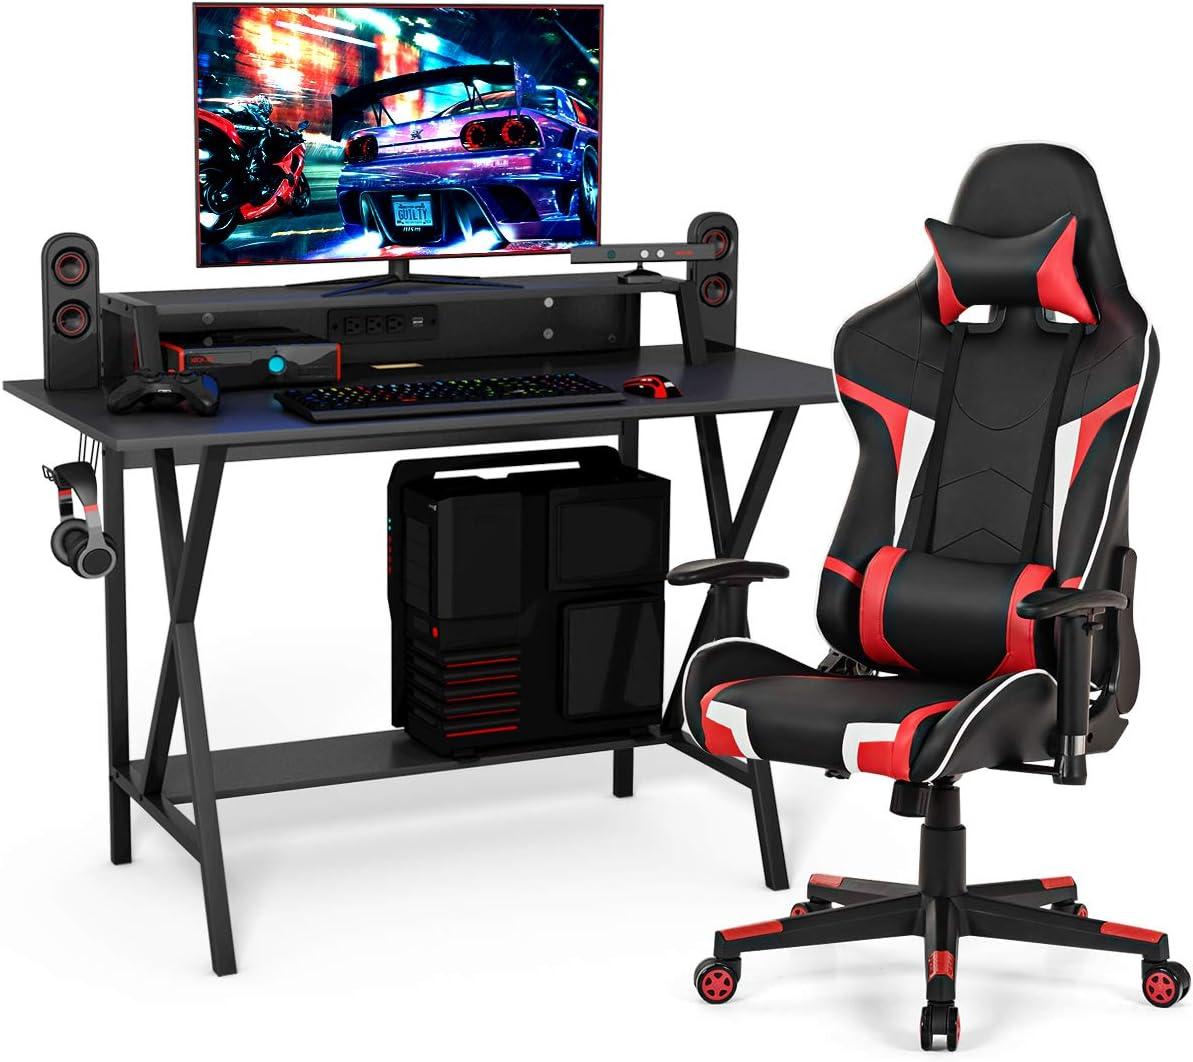 Tangkula Gaming Desk and Chair Set, Ergonomic E-Sport Gamer Desk & Racing Chair Set w/Cup Holder, Monitor Stand, Earphone Hook, Massage & Headrest, Home Office Computer Desk Chair Set (Red)